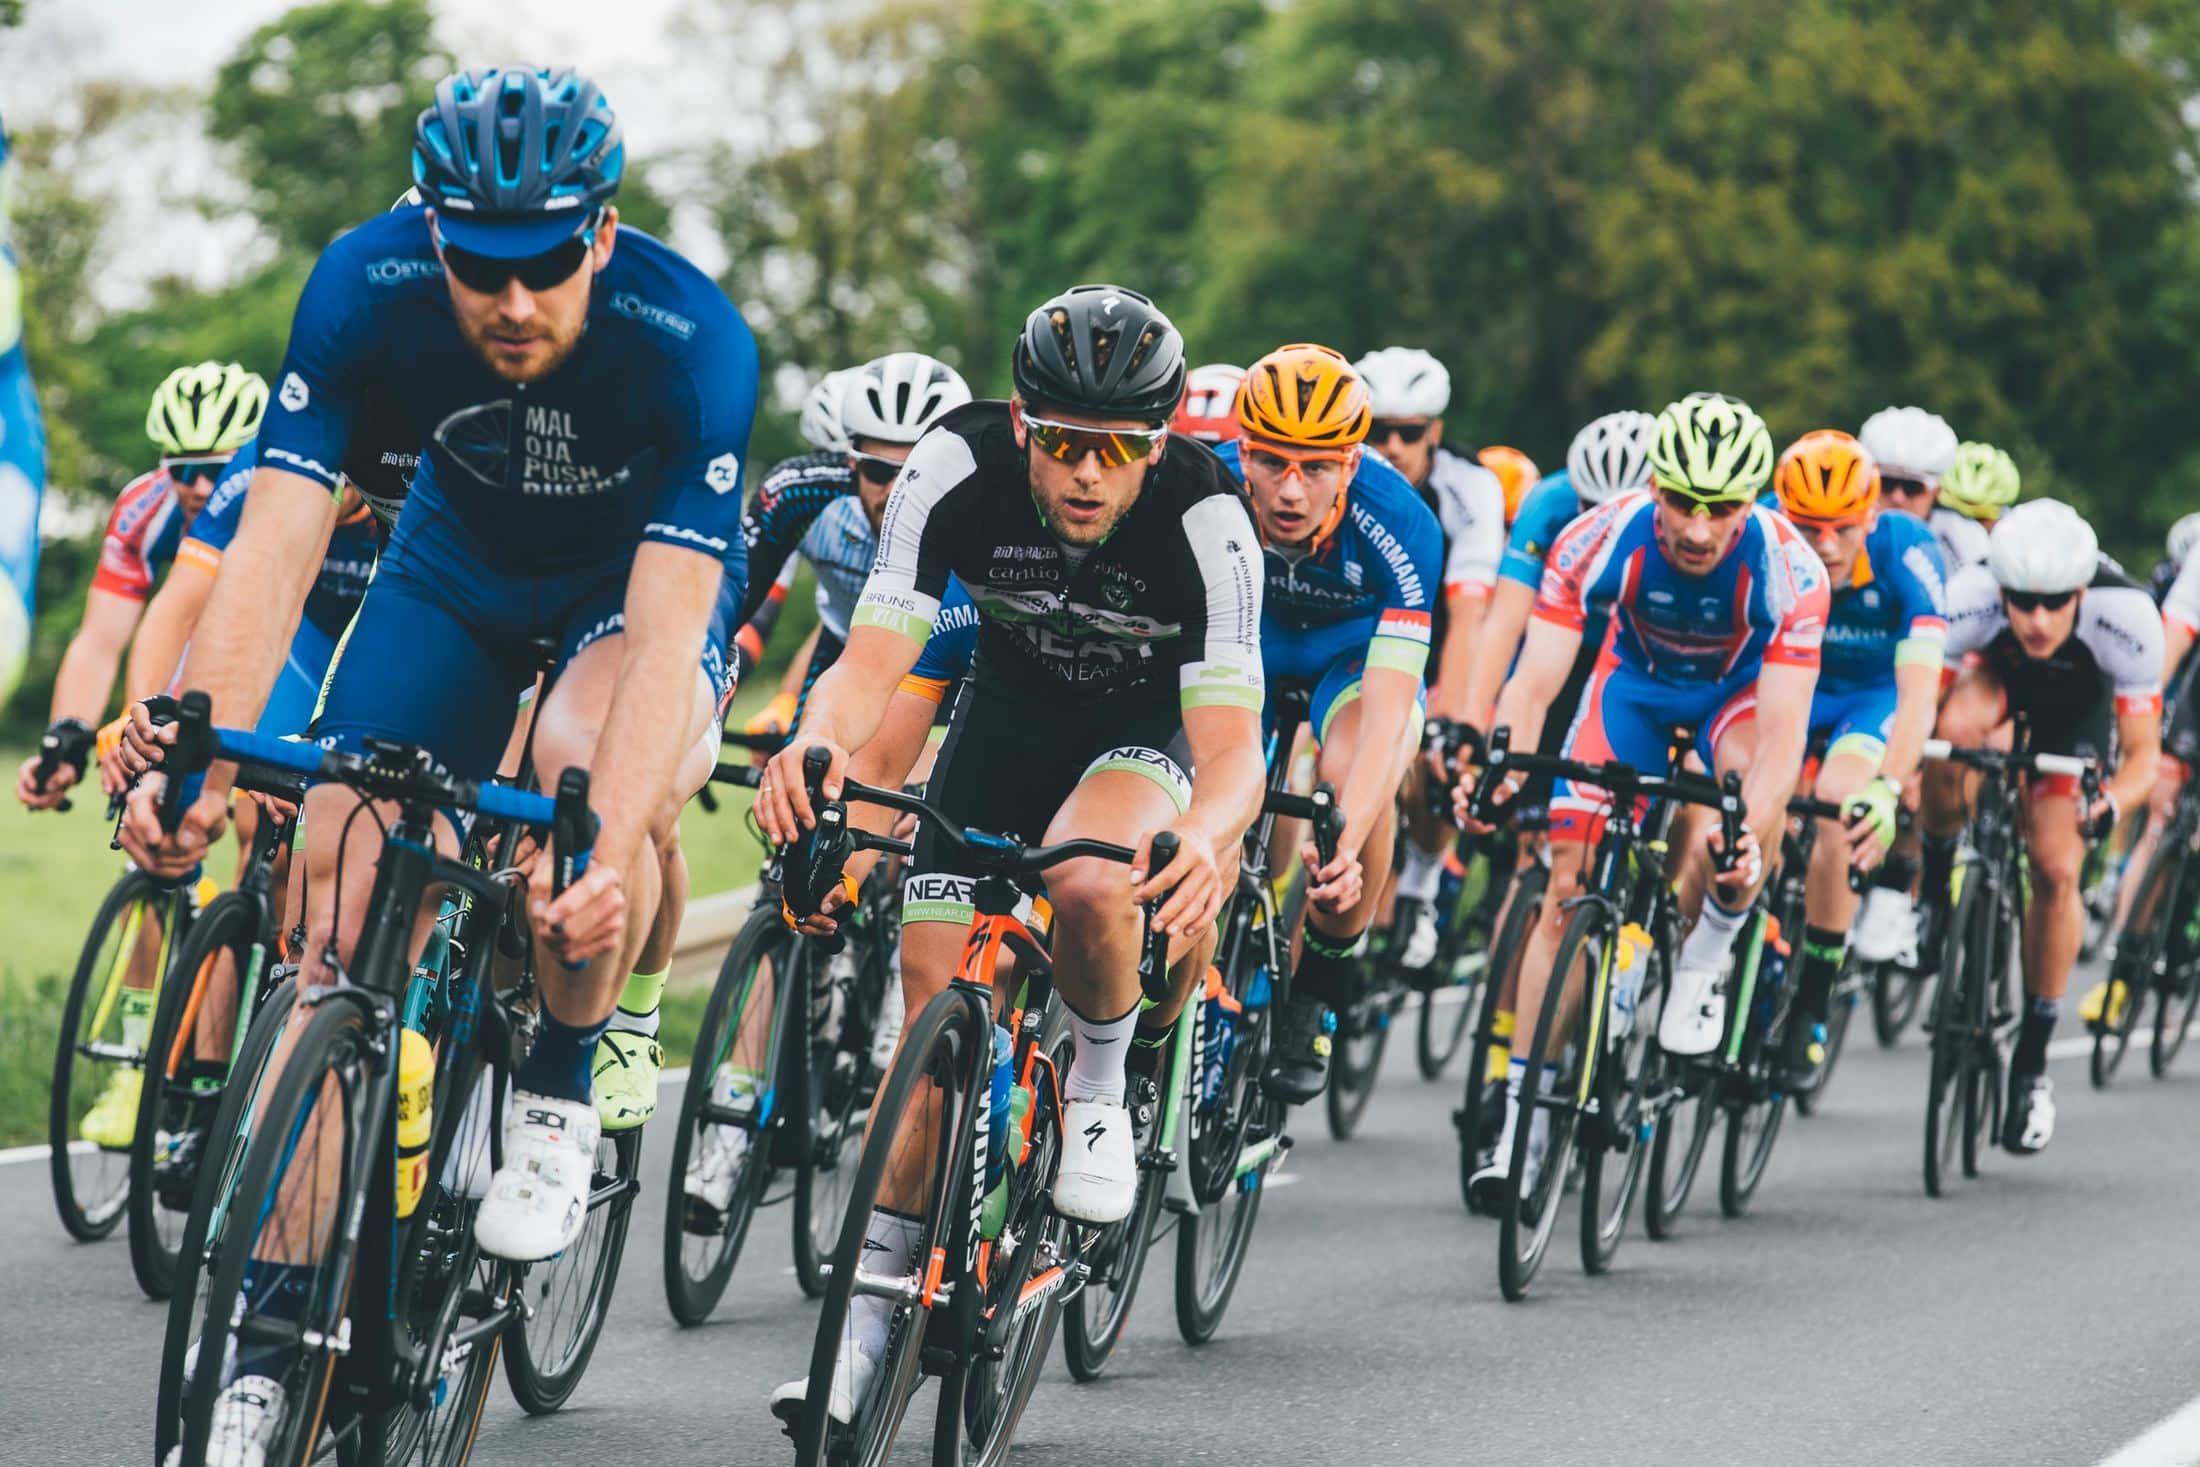 group of cyclist on asphalt road